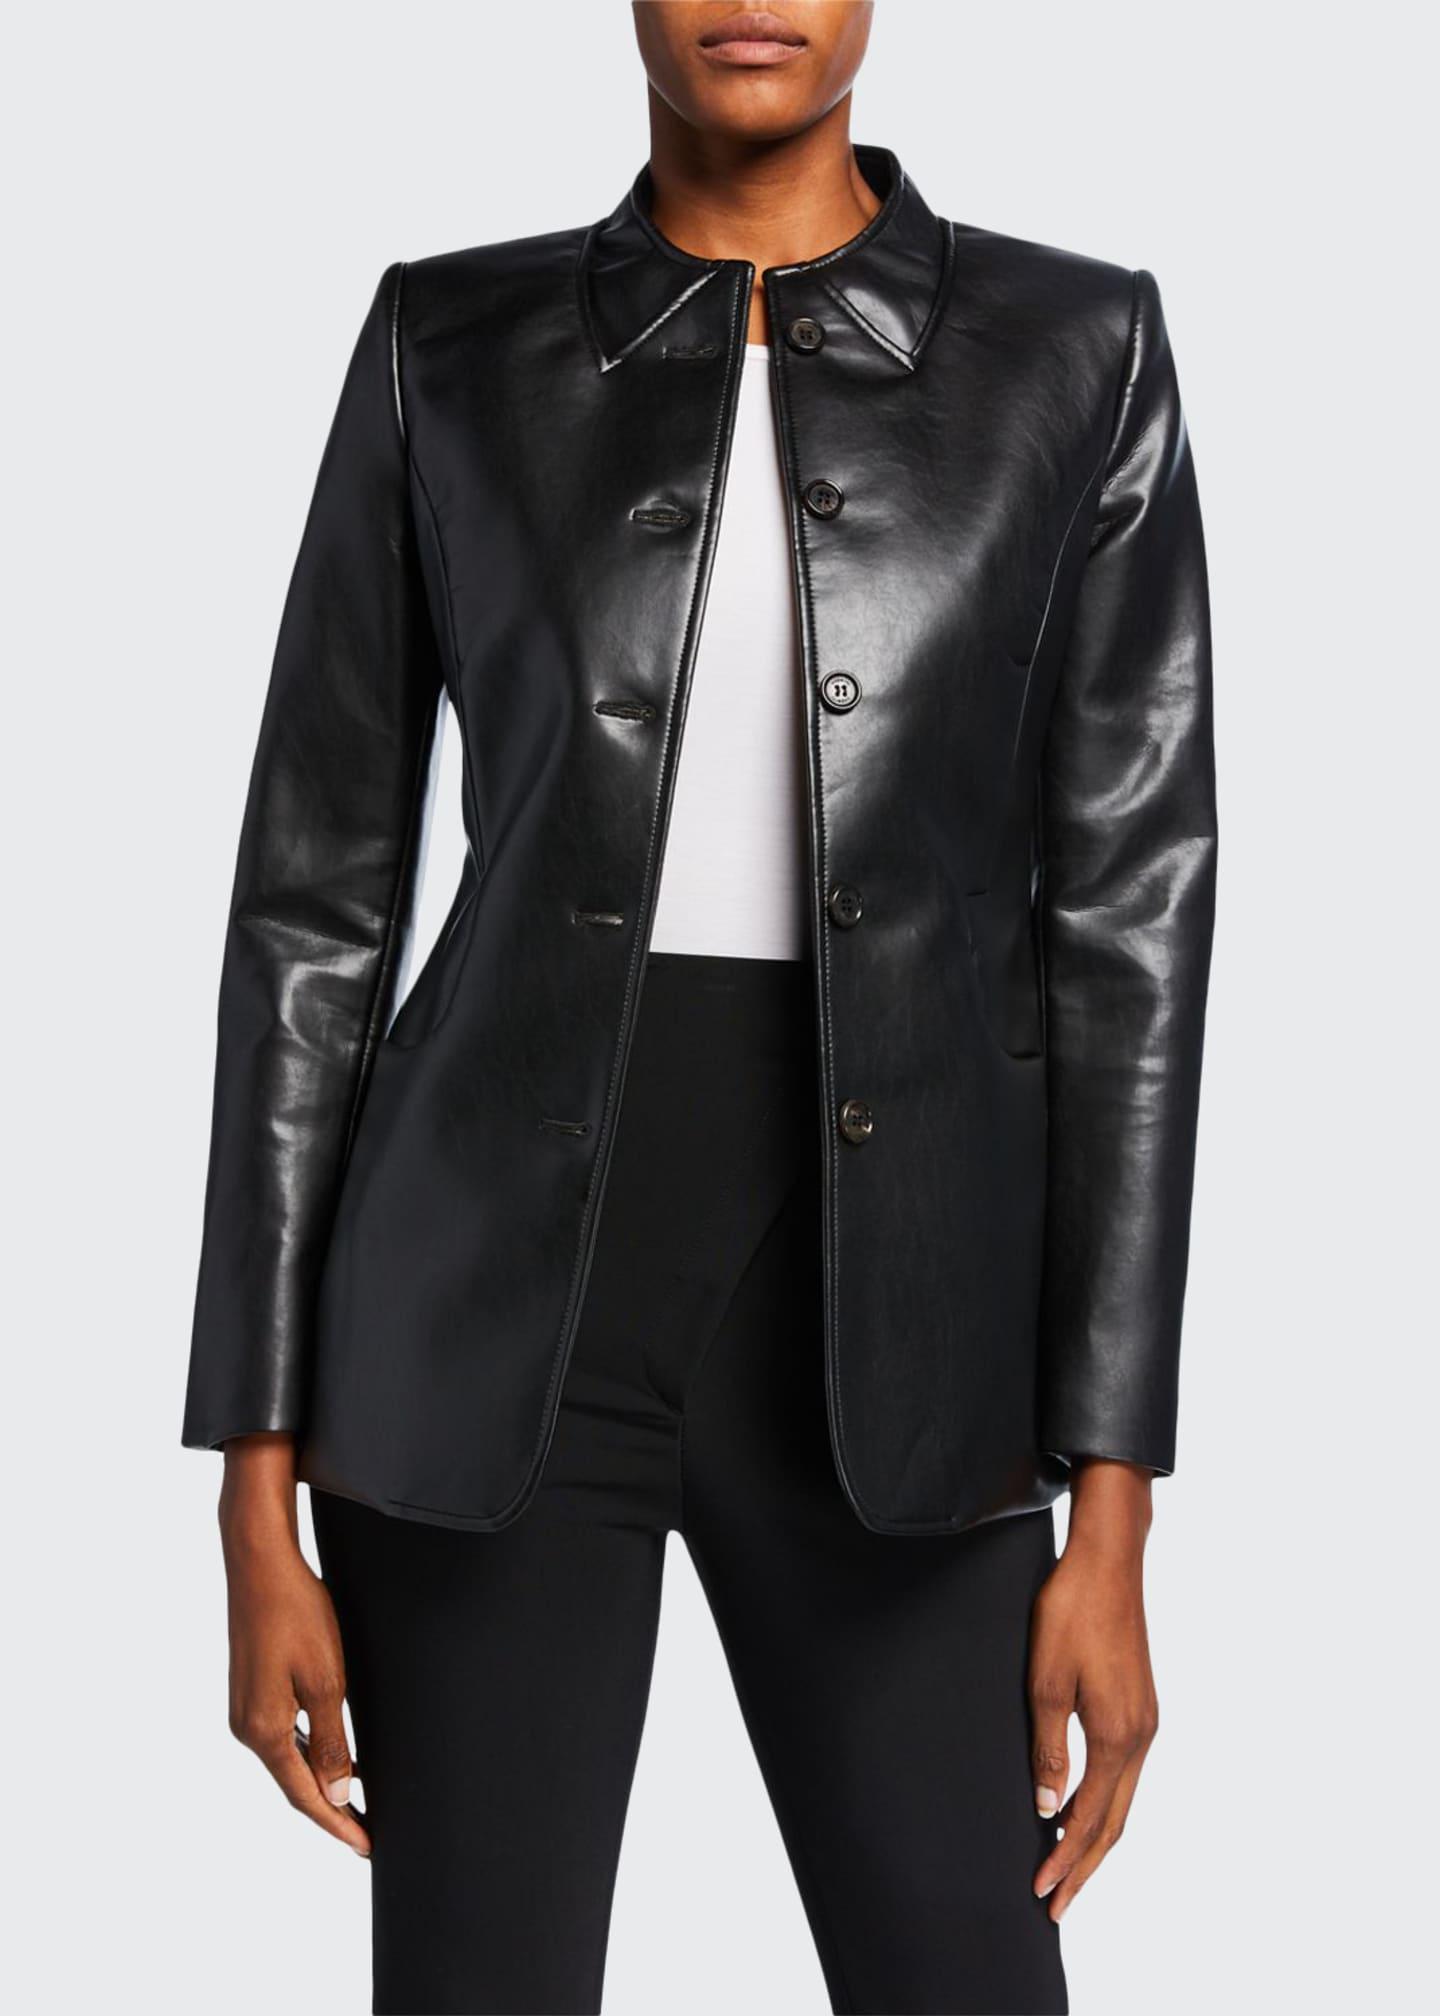 Coperni Trompe l'Oeil-Collar Tailored Faux-Leather Jacket